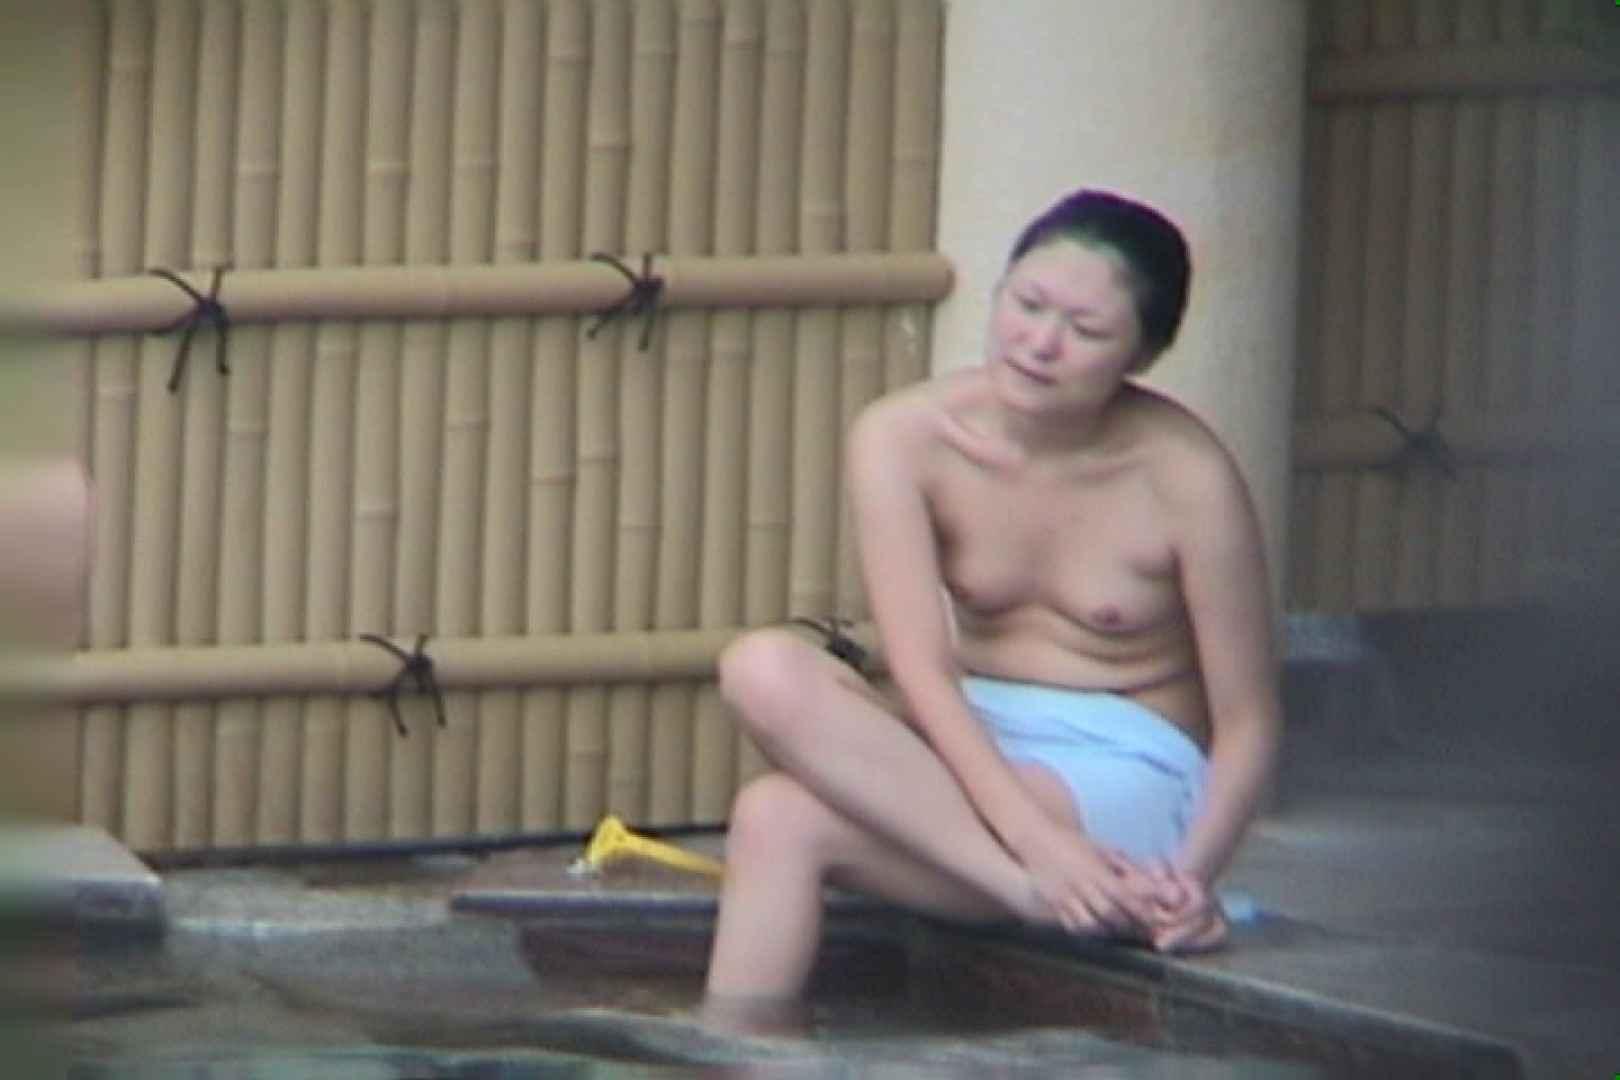 Aquaな露天風呂Vol.601 HなOL 戯れ無修正画像 99pic 97